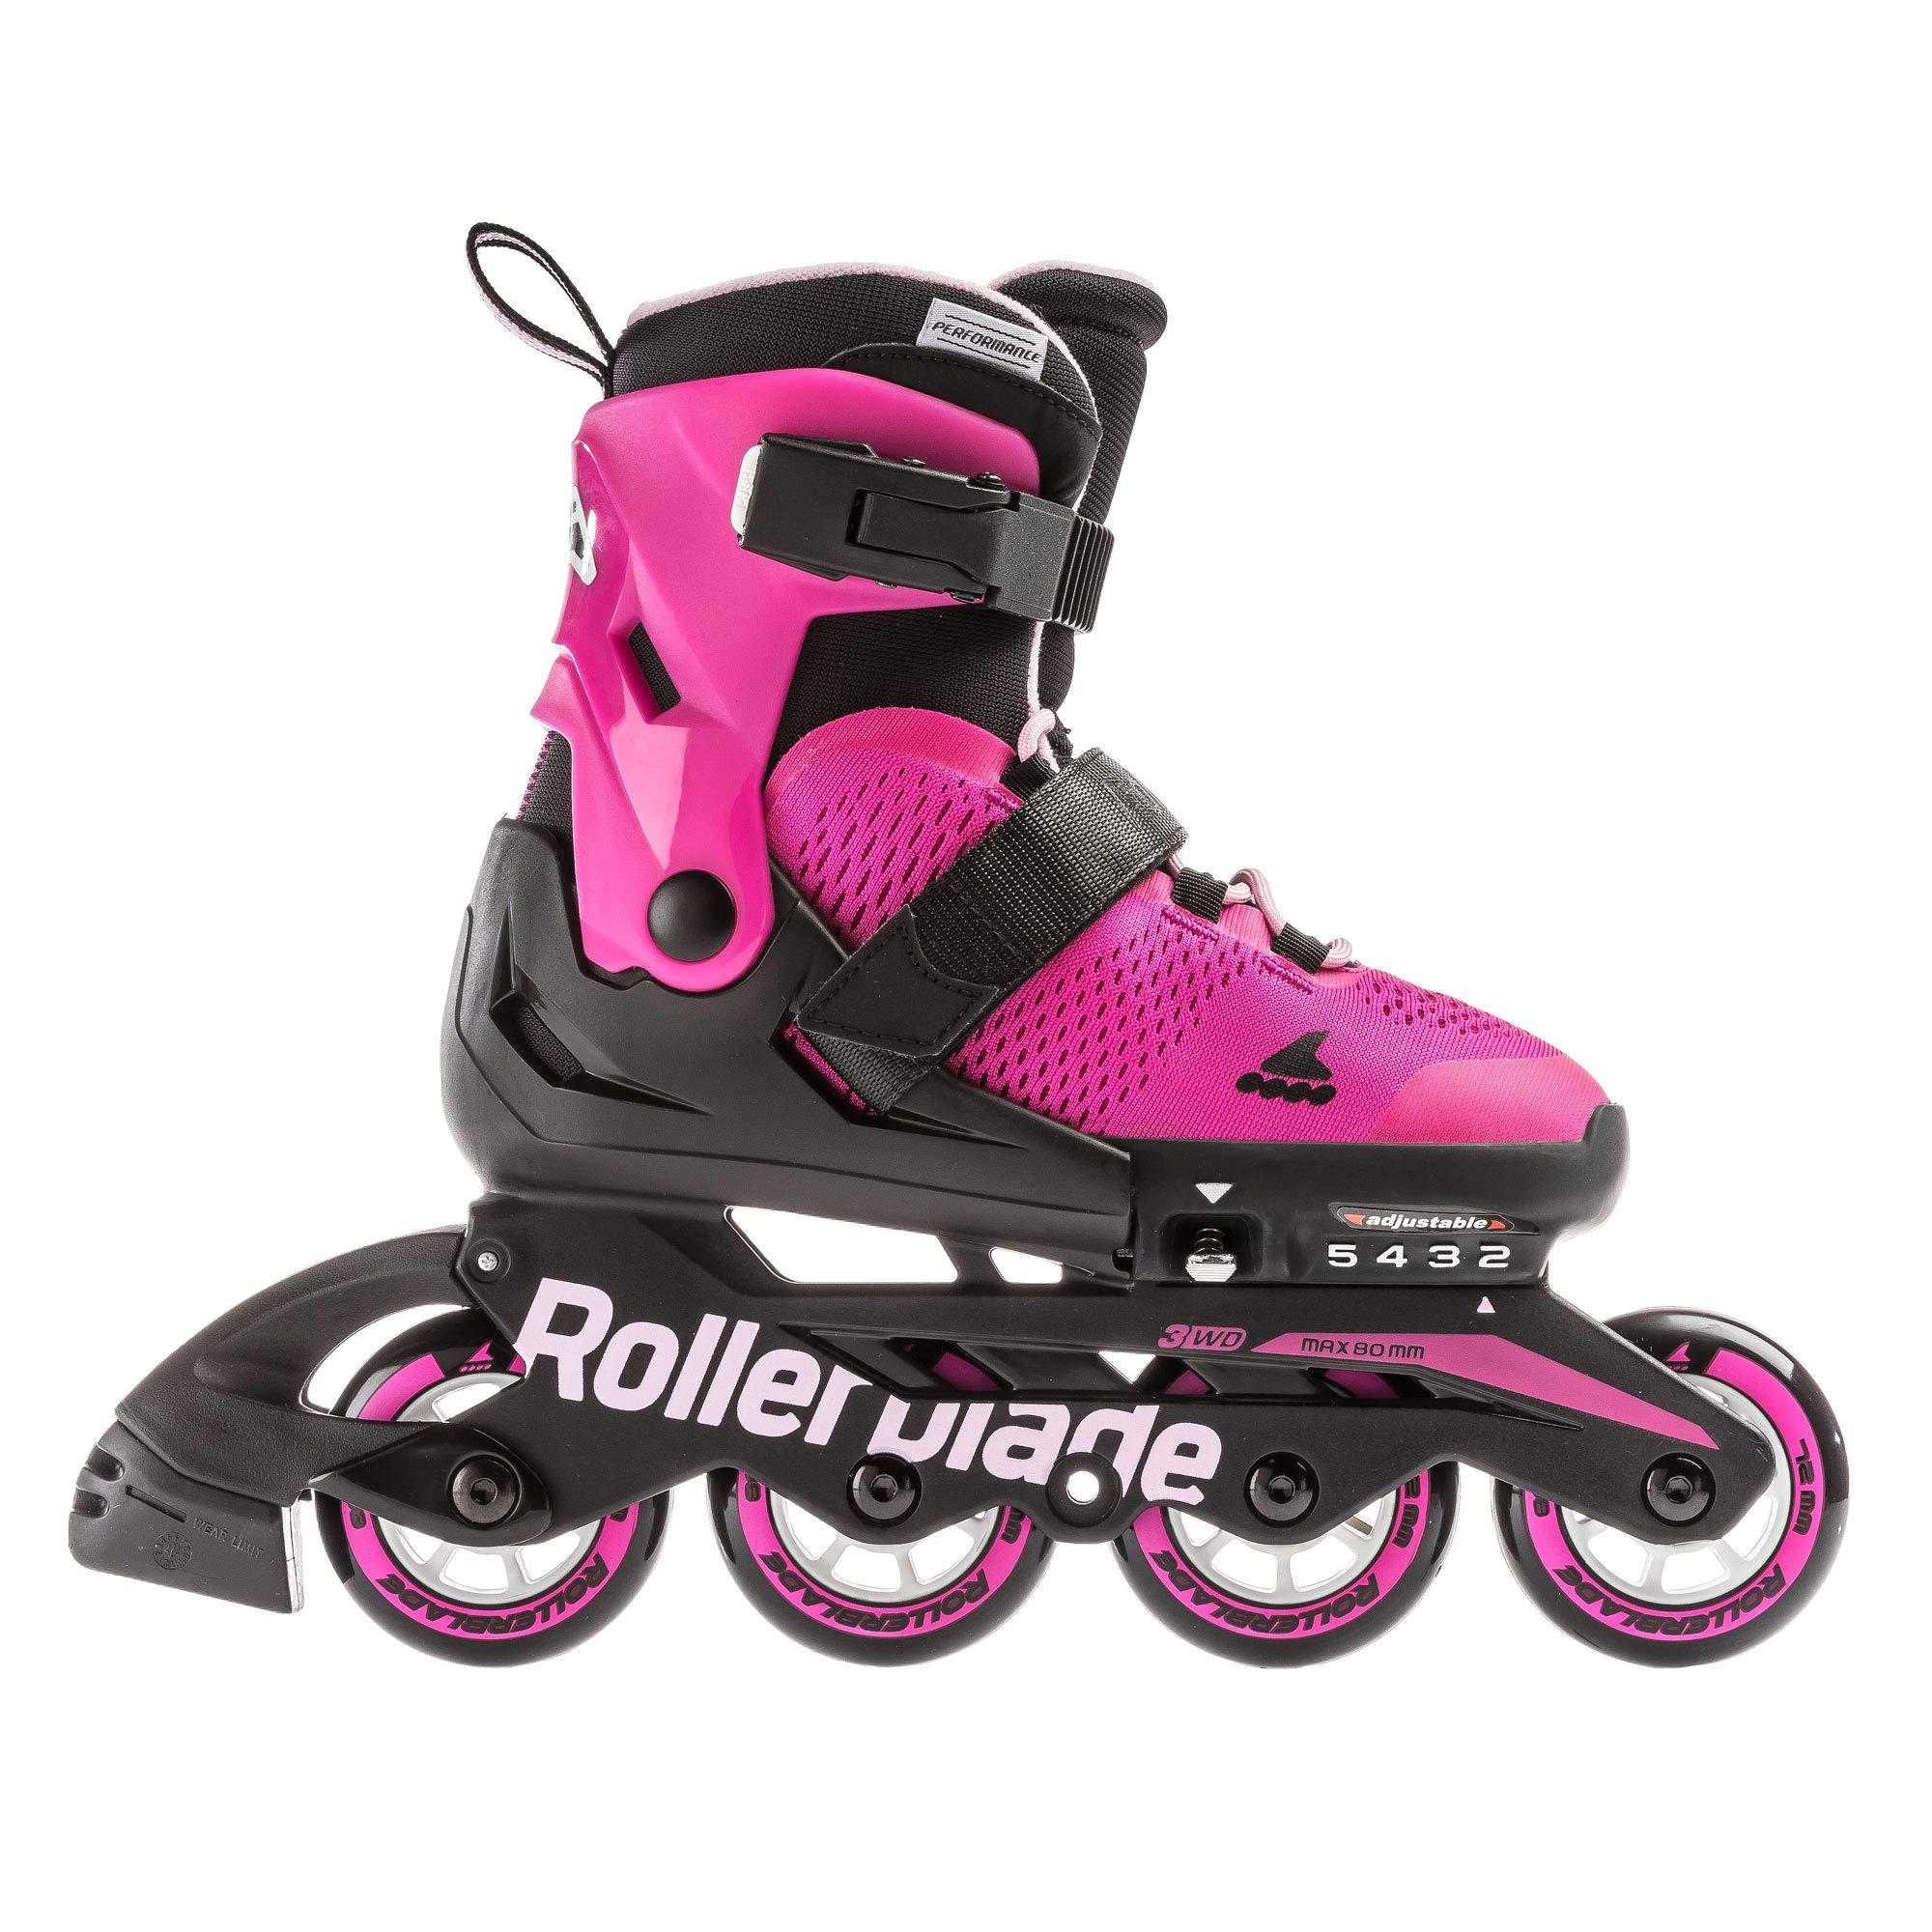 Rollerblade Microblade Junior 4 Wheel Inline Skates (Pink, 17.5-21.0)